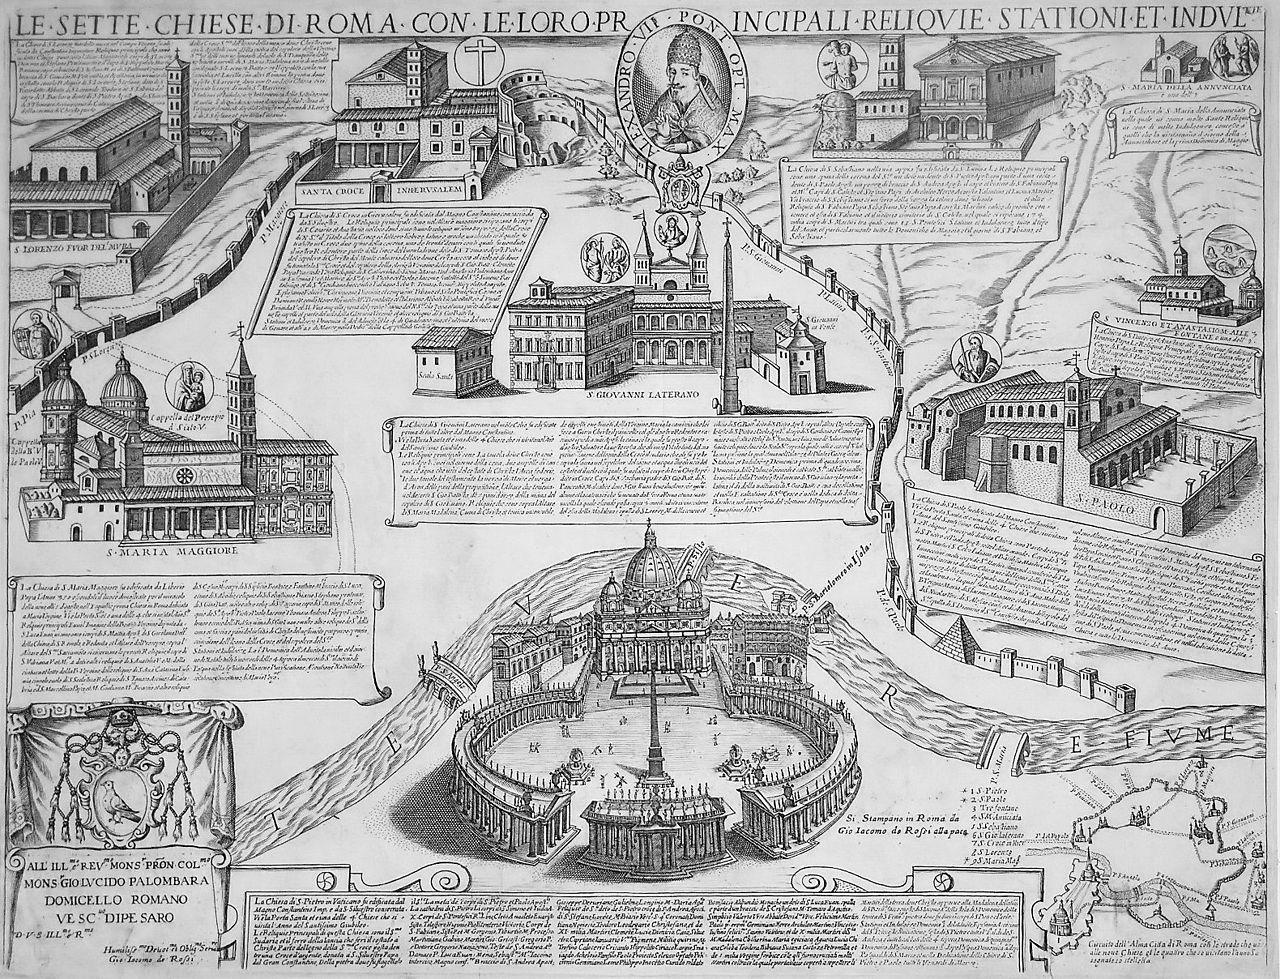 1280px-Seven_Churches_of_Rome_-_Giacomo_Lauro_-_1599